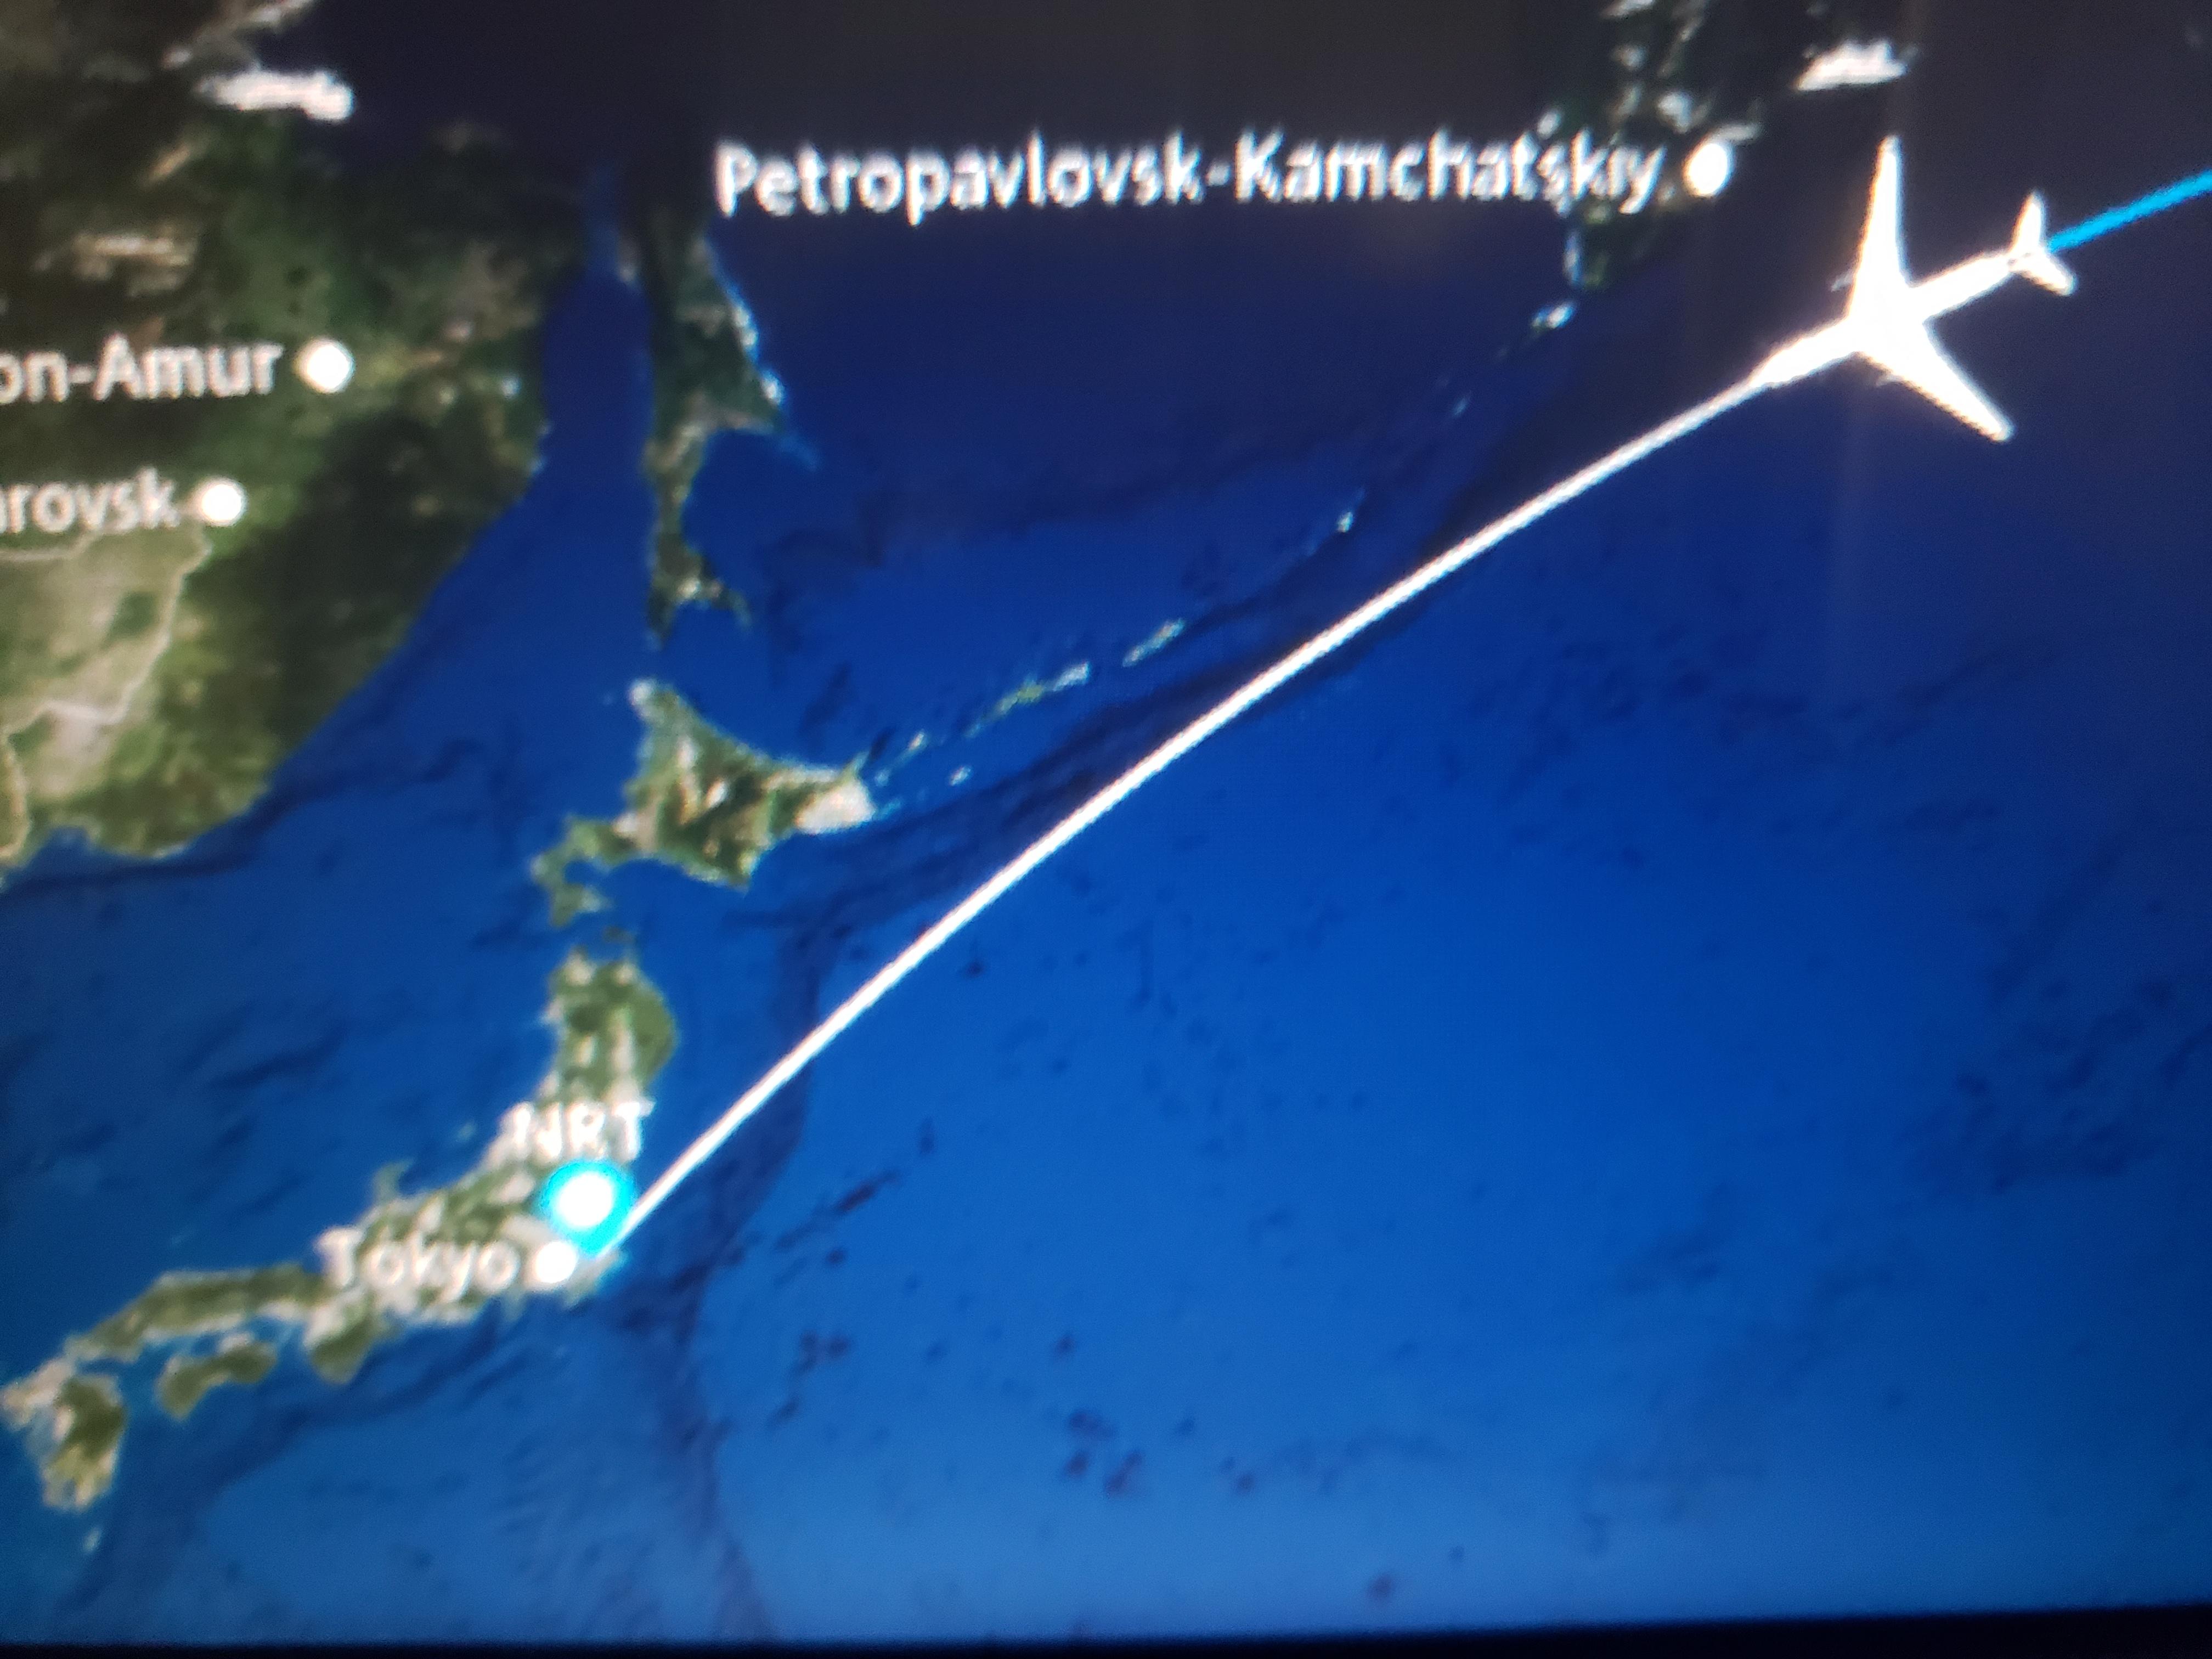 travel, Japan, delta airlines, trip, yokosuka, tokyo, psns, puget sound naval shipyard, new hotel yoksuka, tokyo narita airport, seatac airport